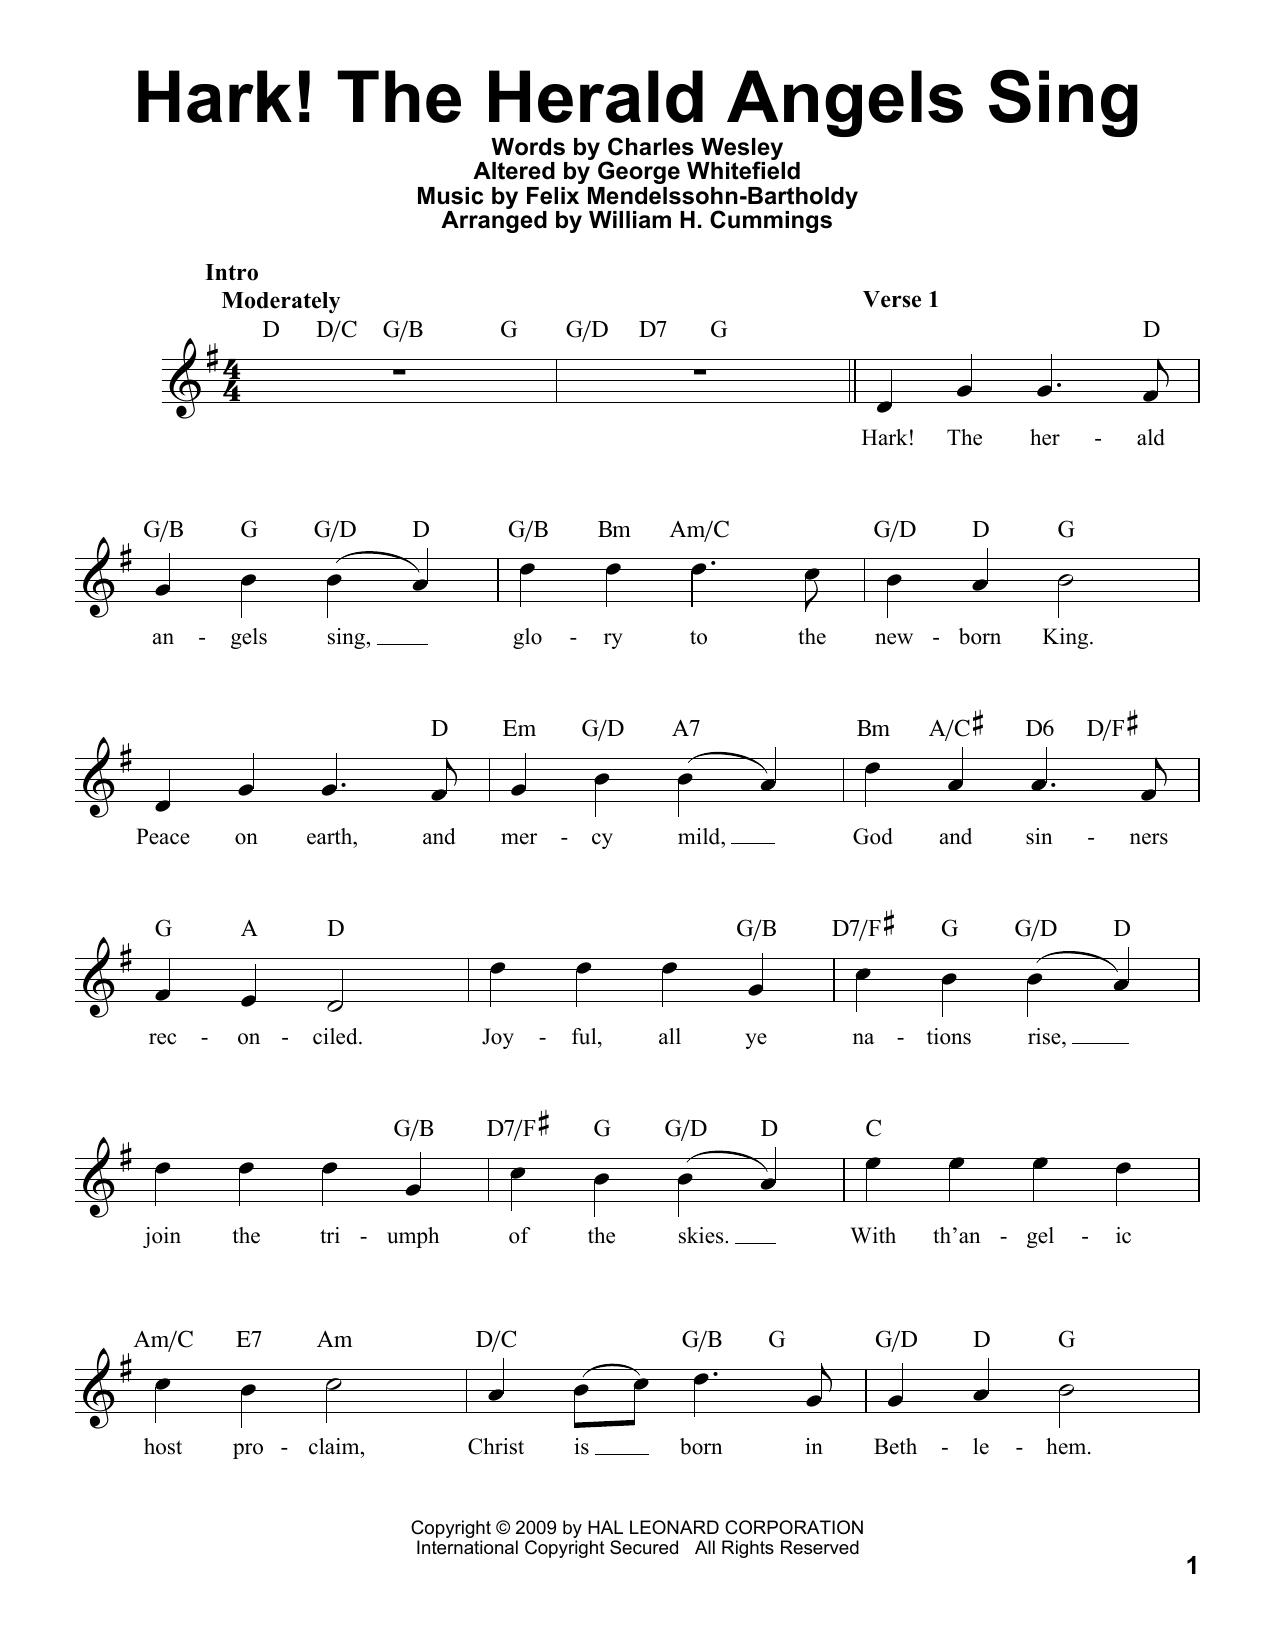 Hark! The Herald Angels Sing Sheet Music